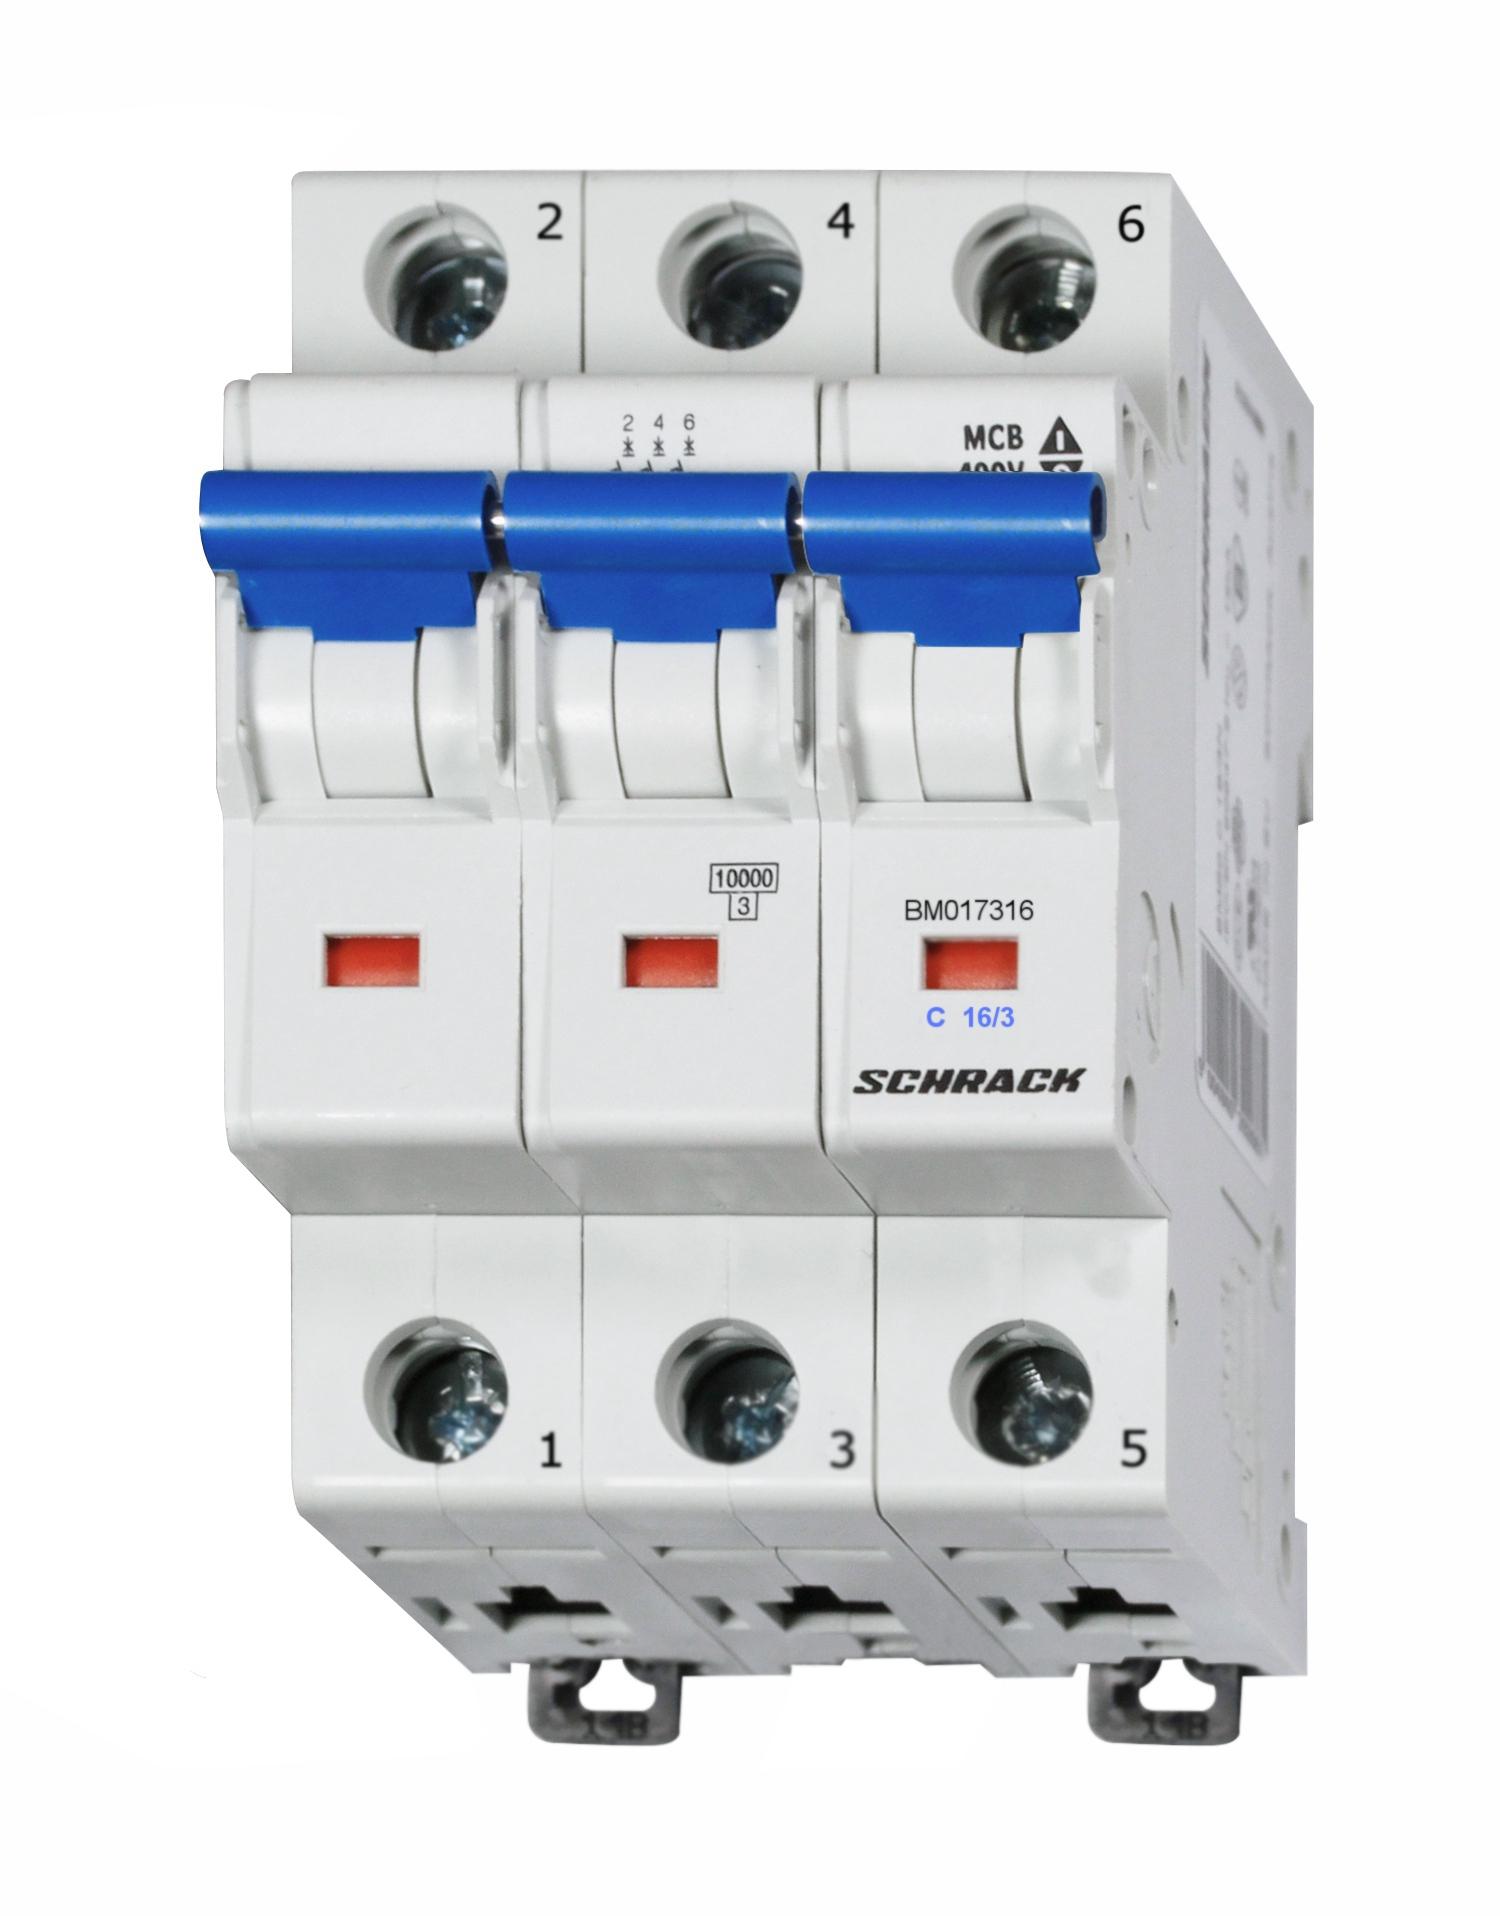 BM017316 - Schrack Technik